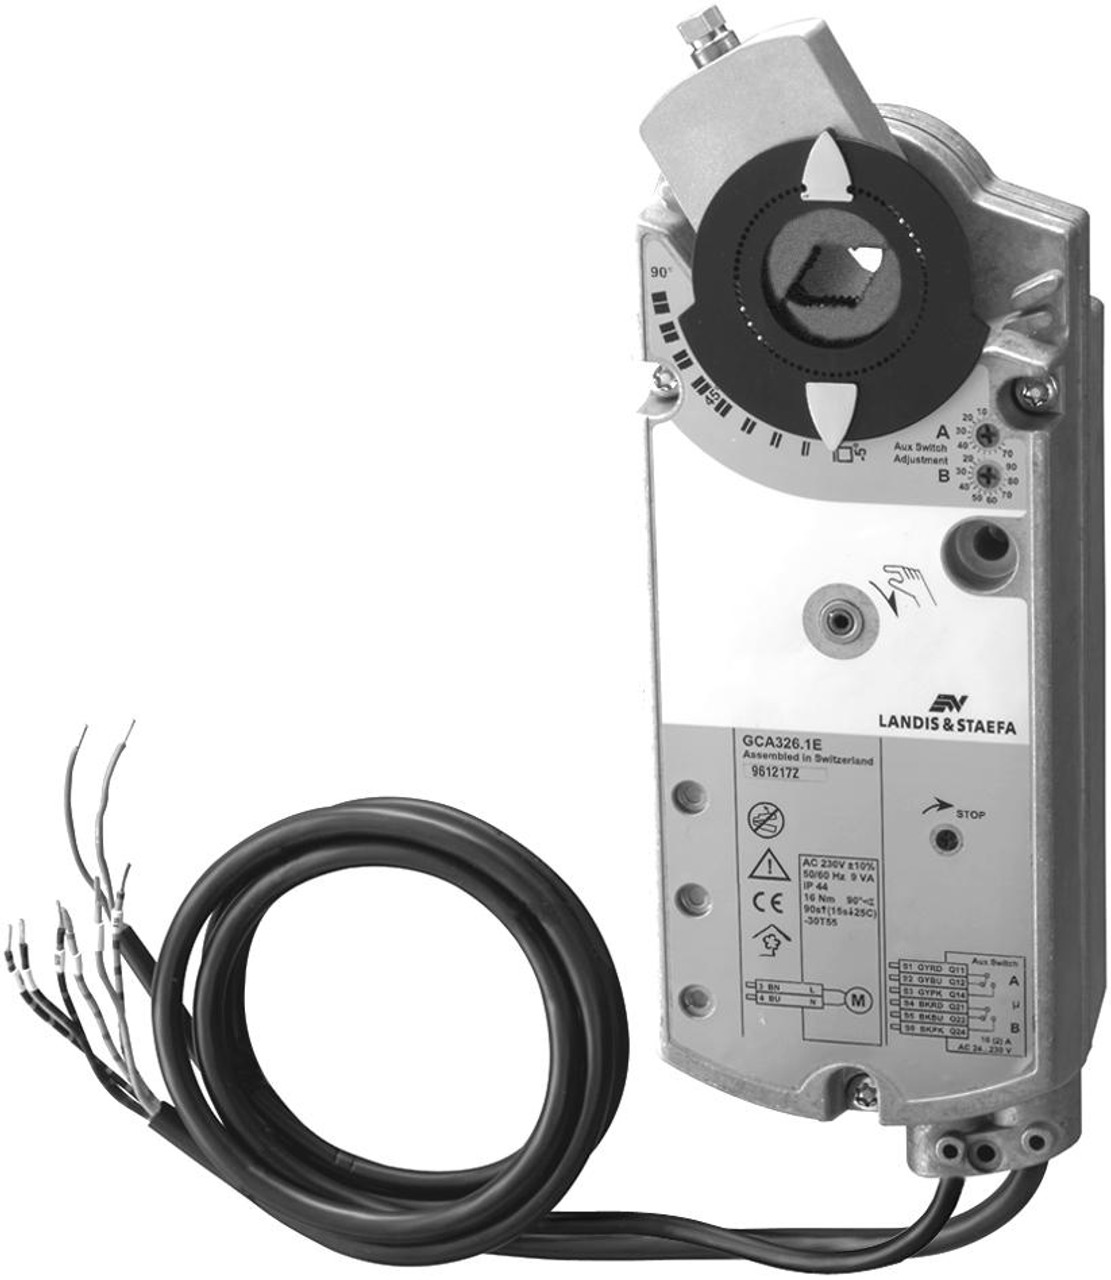 GCA135.1E rotary air damper actuator